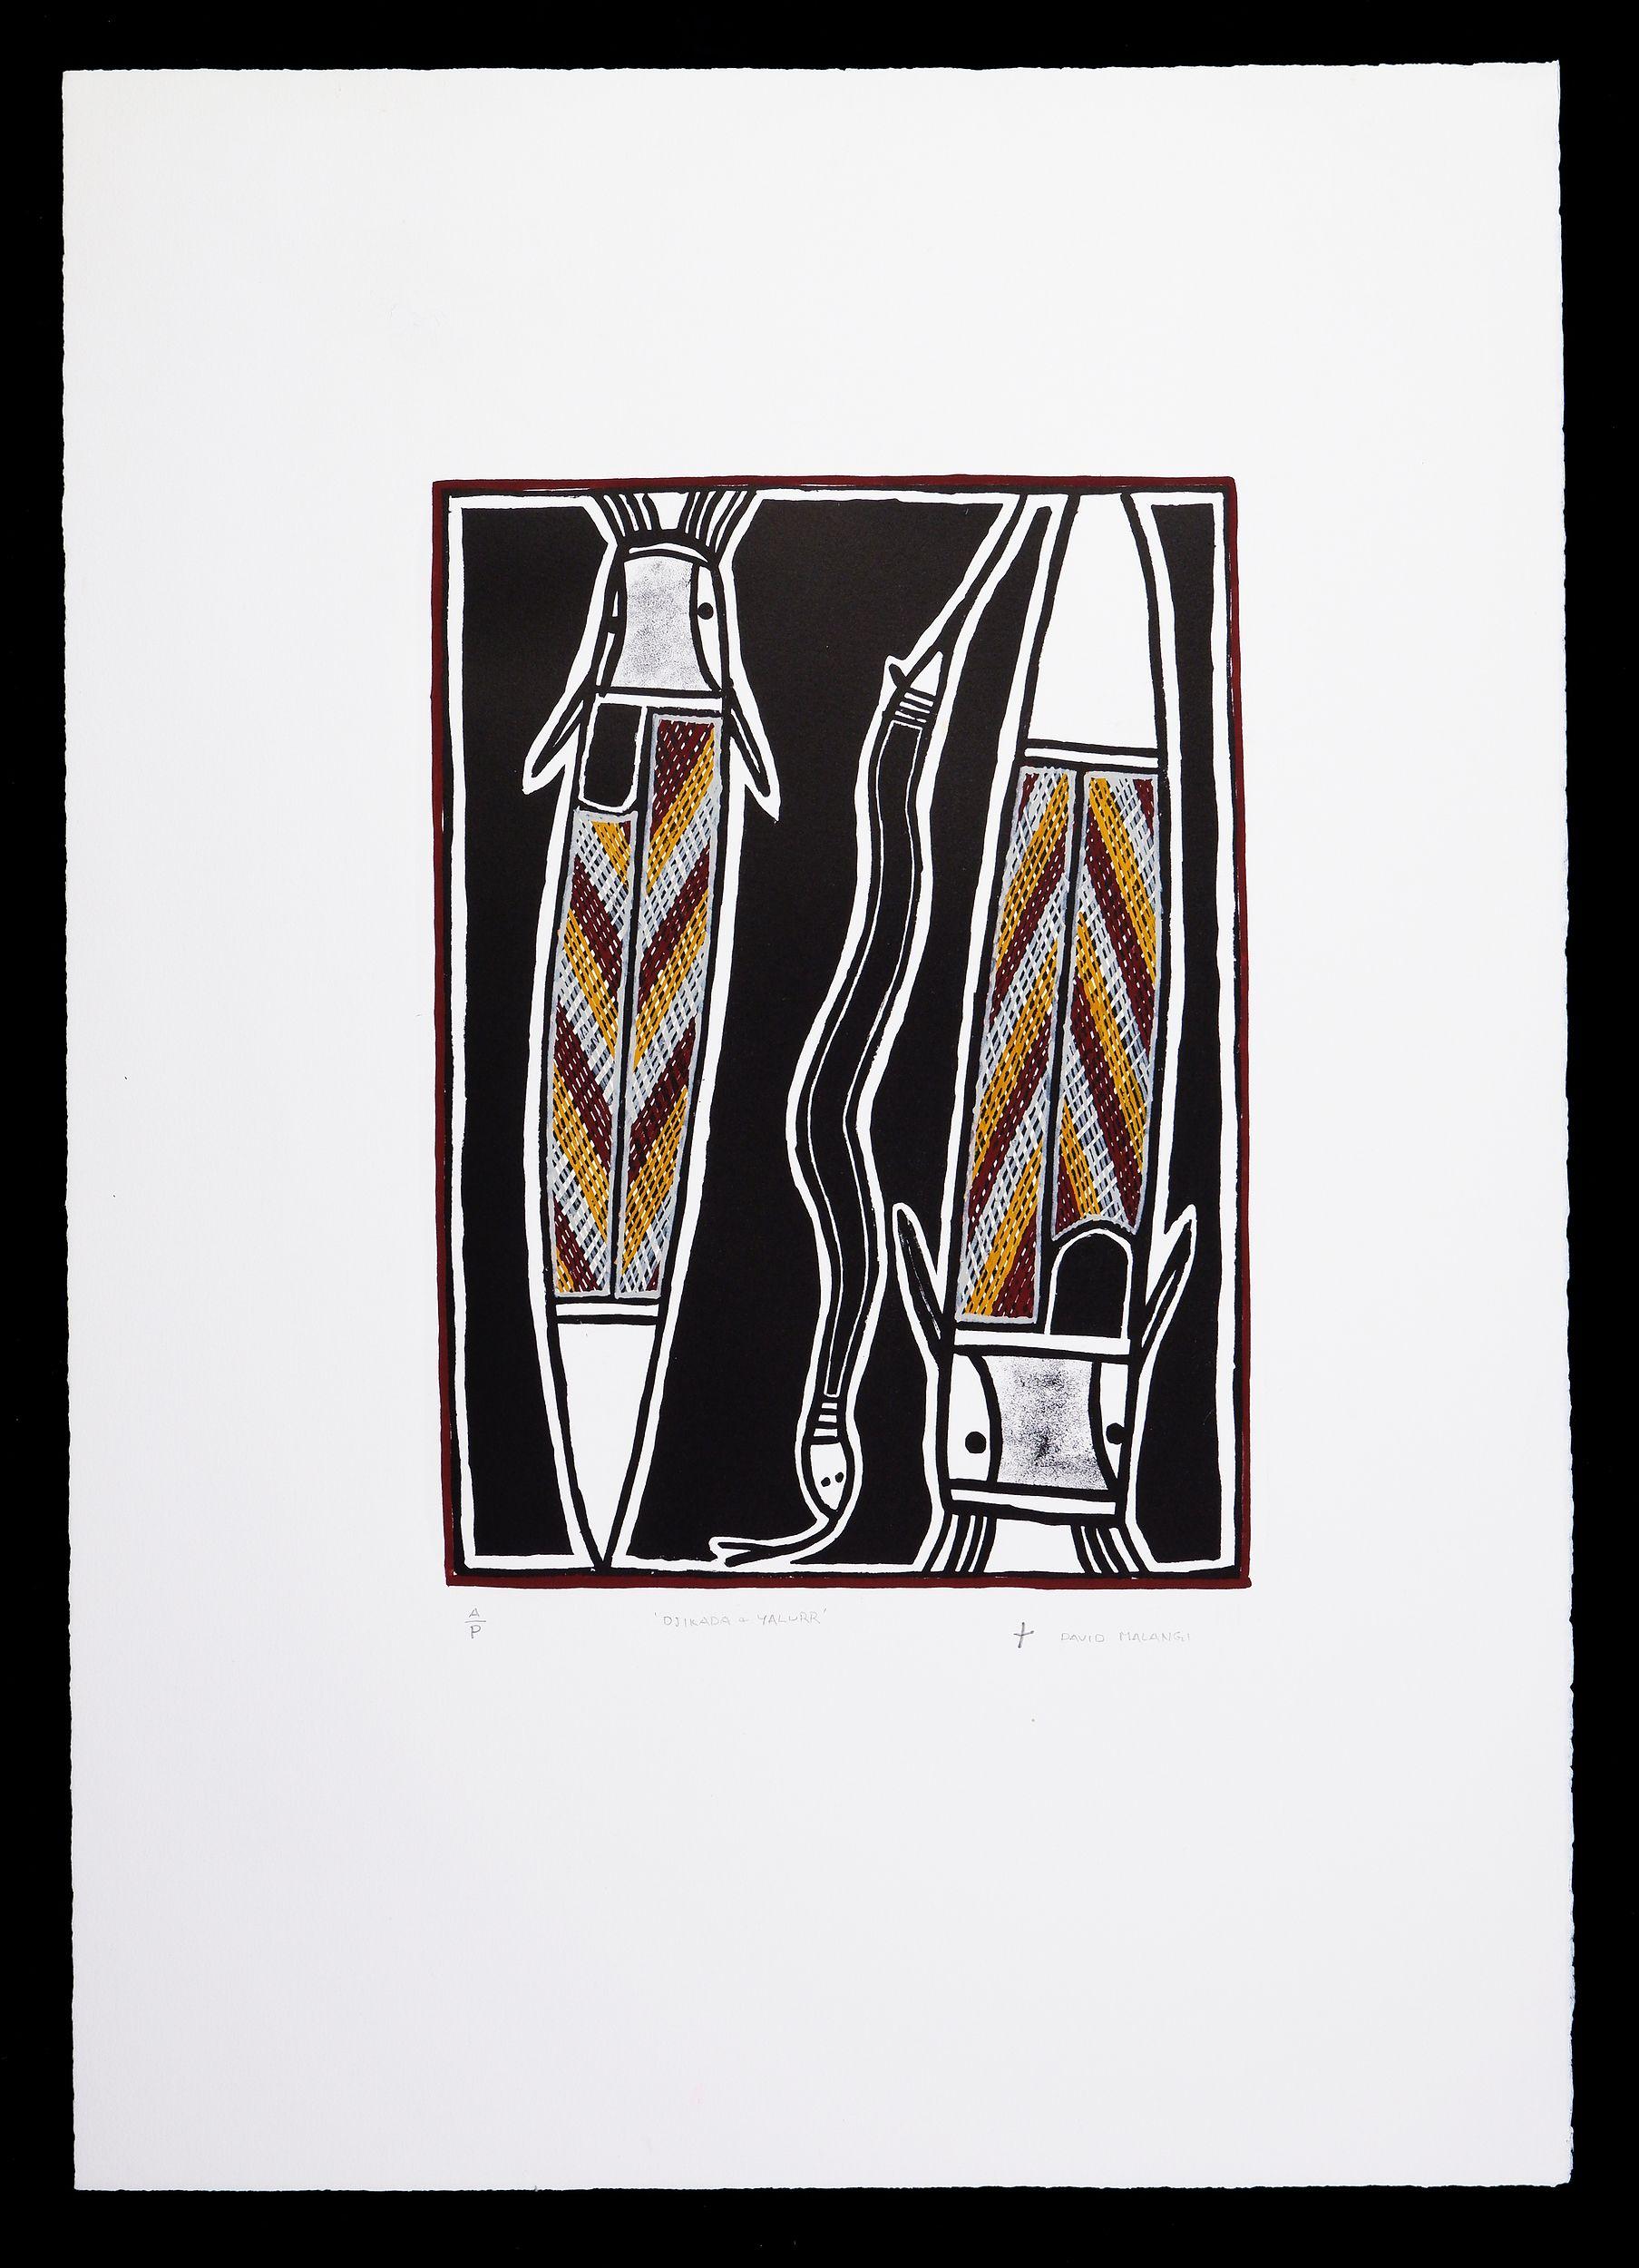 'David Malangi Daymirringu (1927-1999, Manharrngu language group), Djikada & Yallur (Catfish & Snake) 1994, Hand-Coloured Lithograph, Artists Proof, Edition of 30, 40 x 30 cm (image size)'